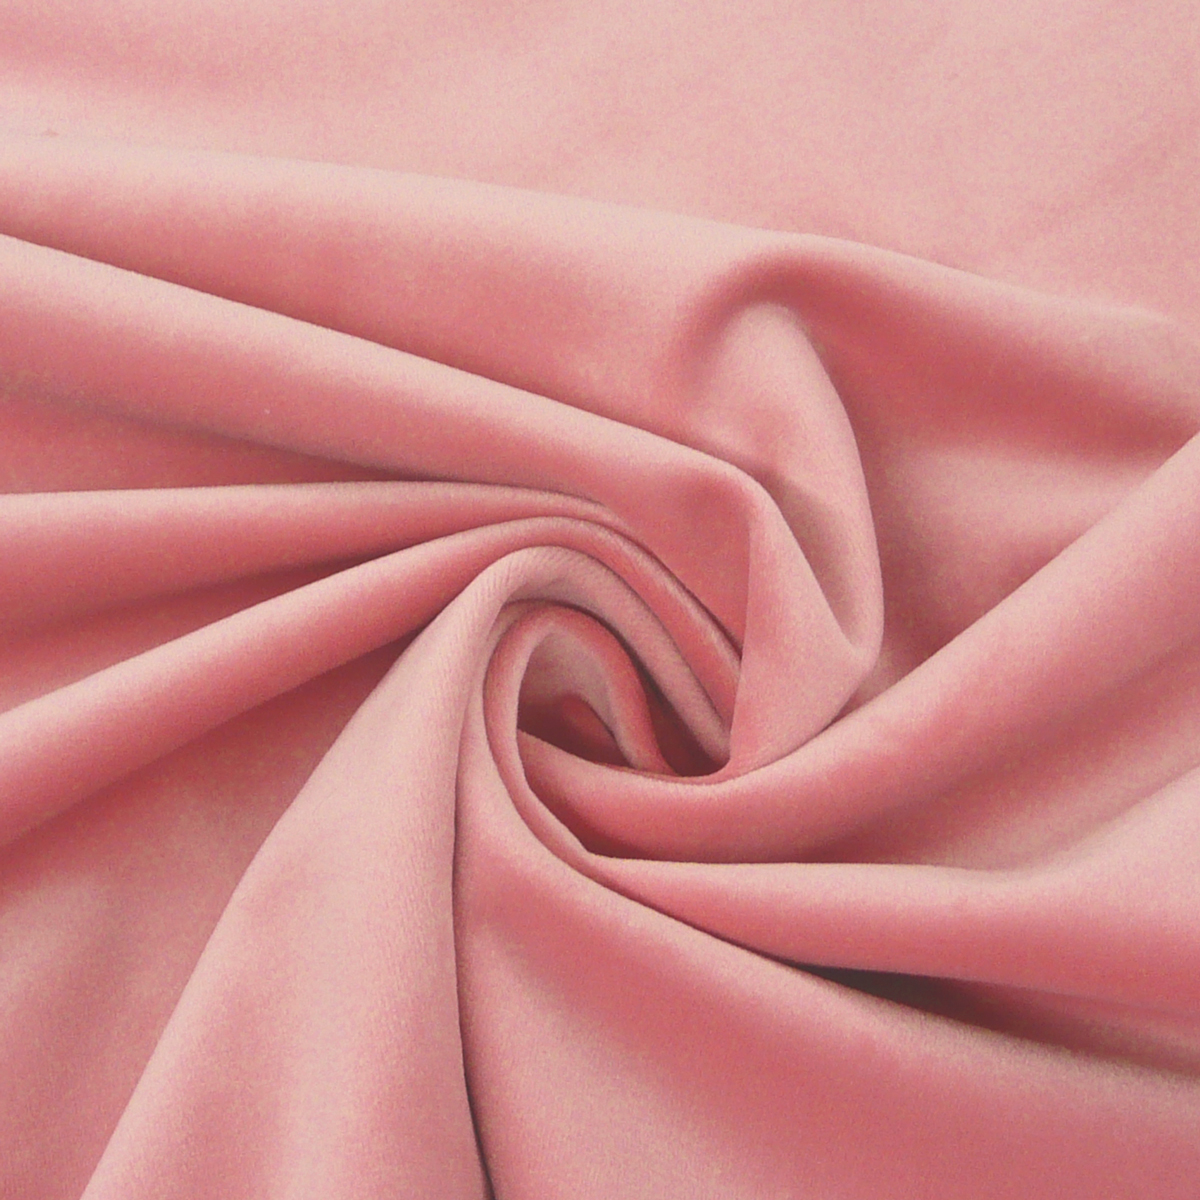 bezugsstoff polsterstoff samtstoff samt pastell rosa stoffe wohnstoffe m belstoffe. Black Bedroom Furniture Sets. Home Design Ideas